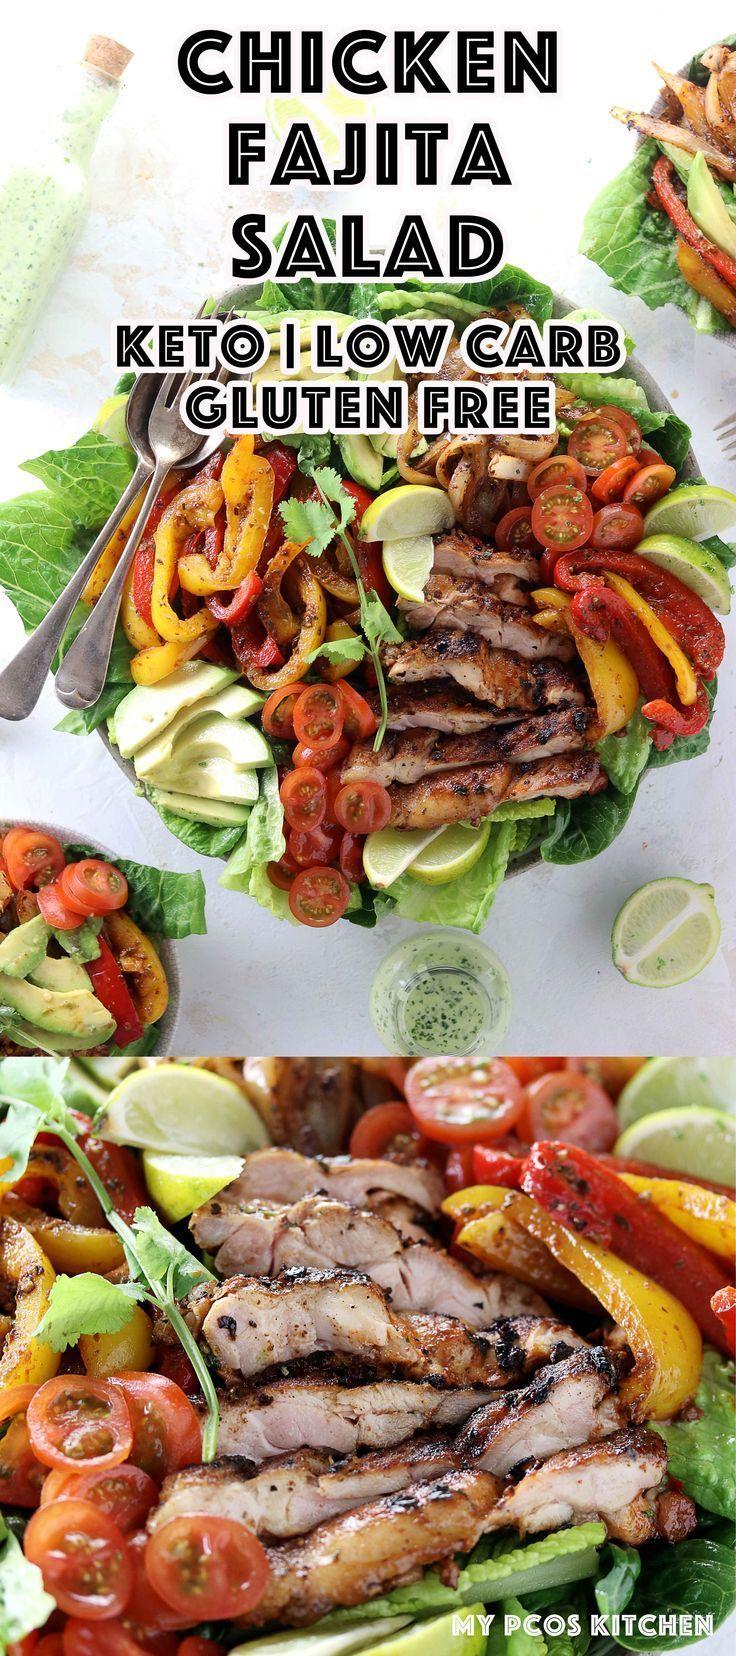 Keto Low Carb Chicken Fajita Salad My PCOS Kitchen A